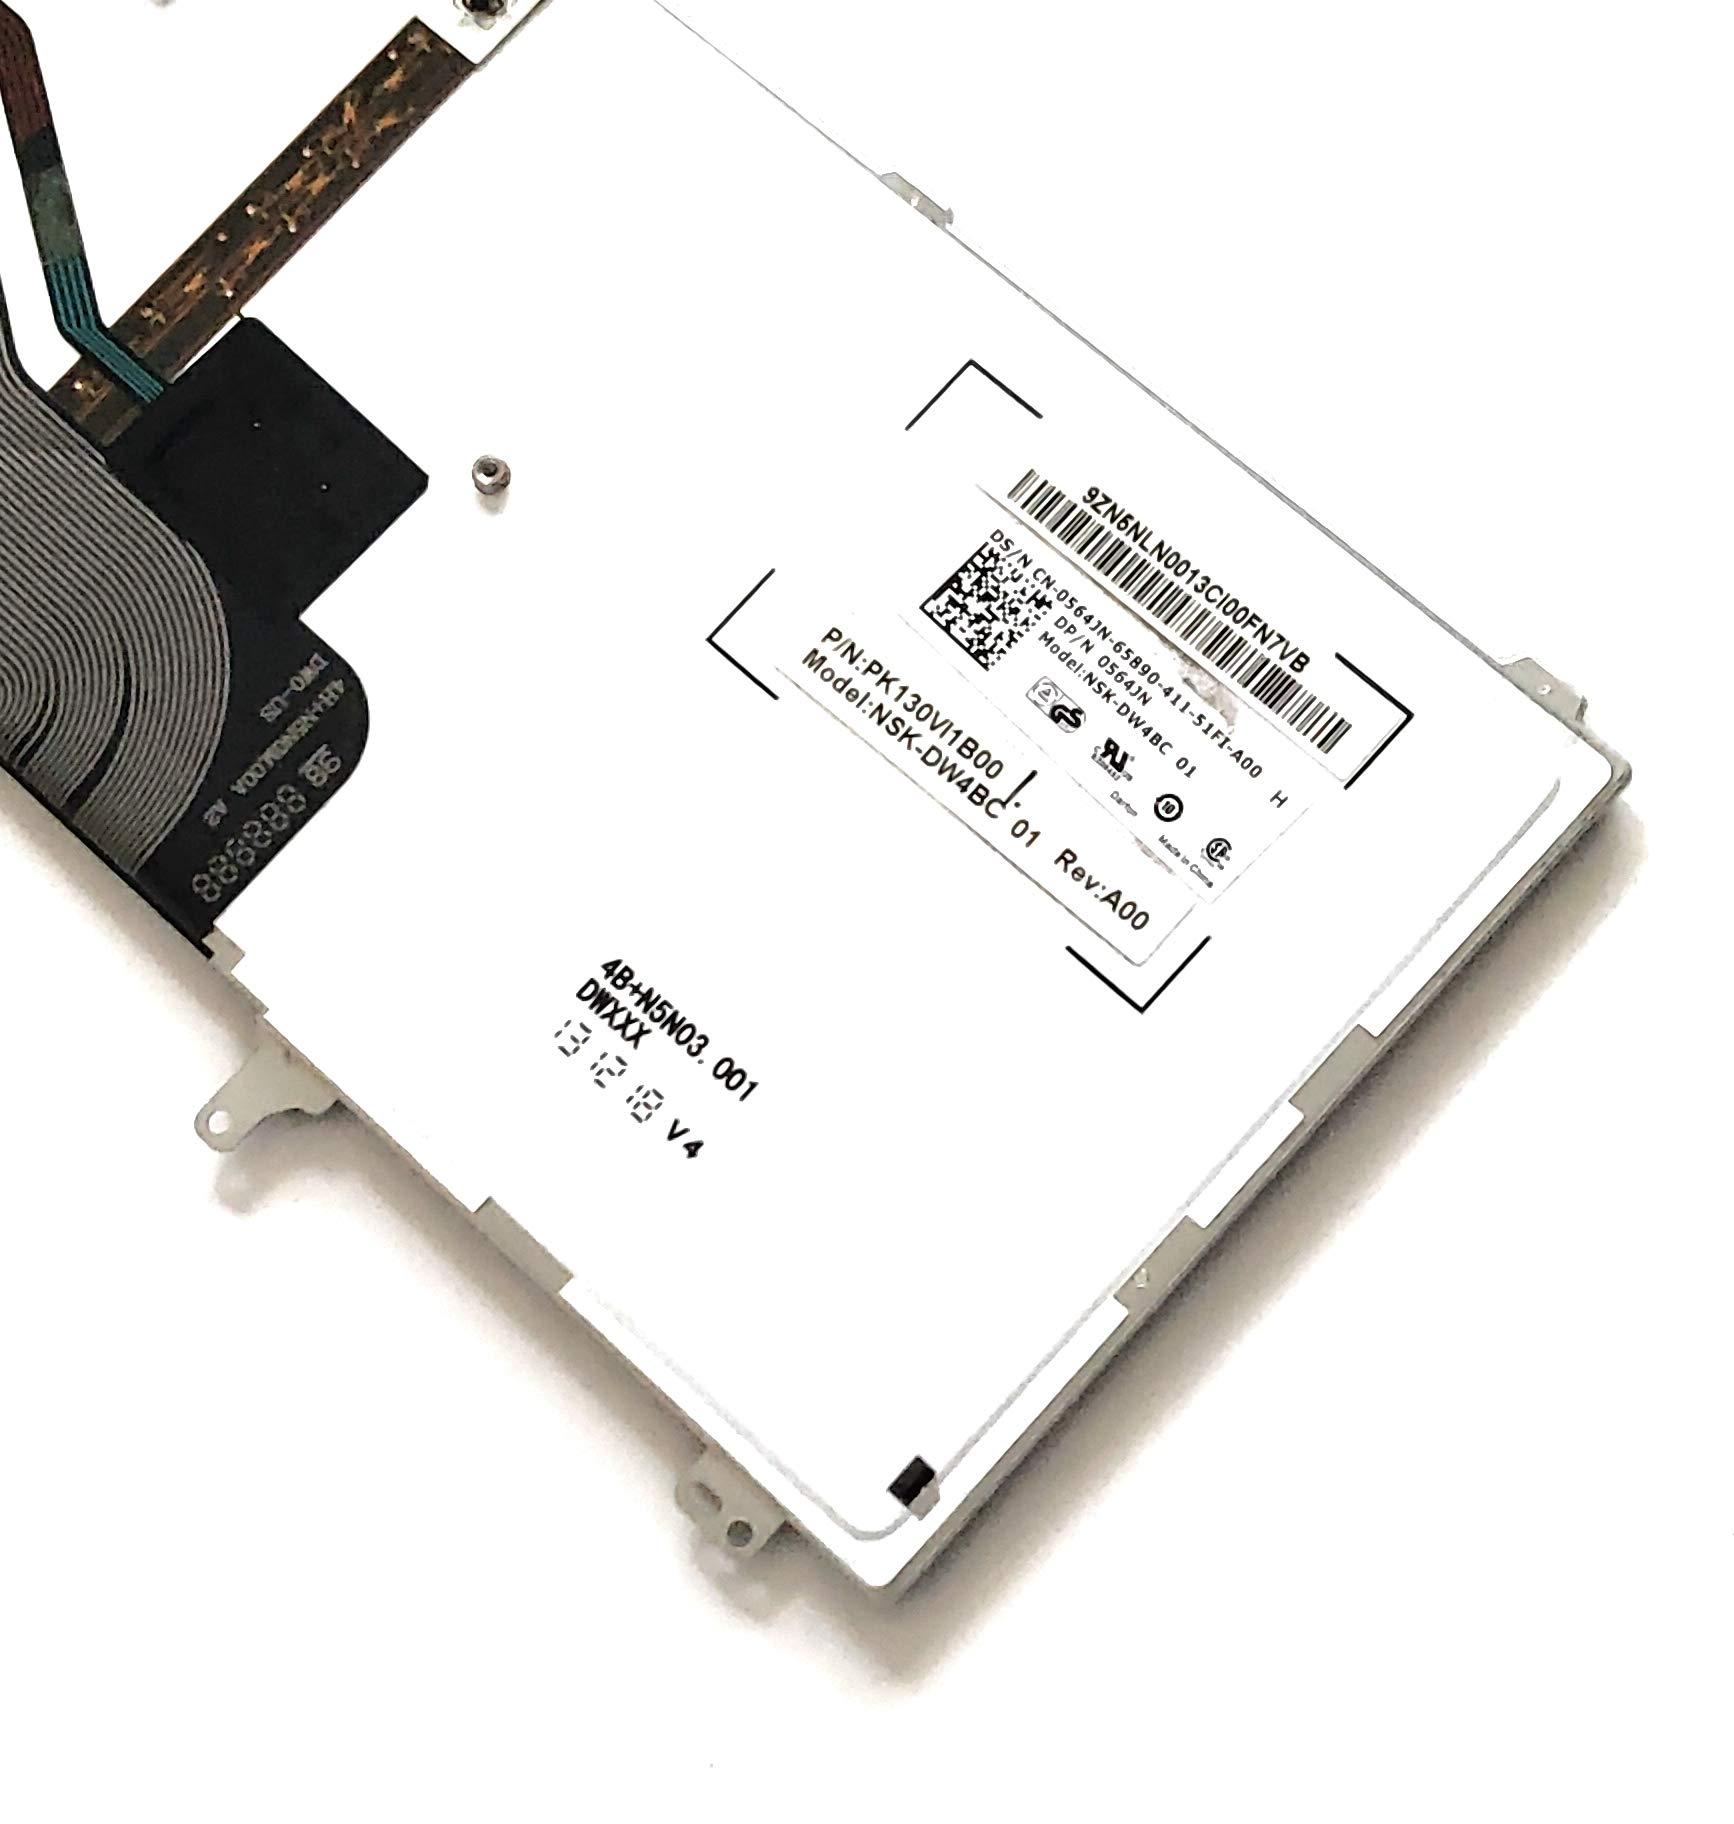 USB 2.0 External CD//DVD Drive for Compaq presario cq41-217au